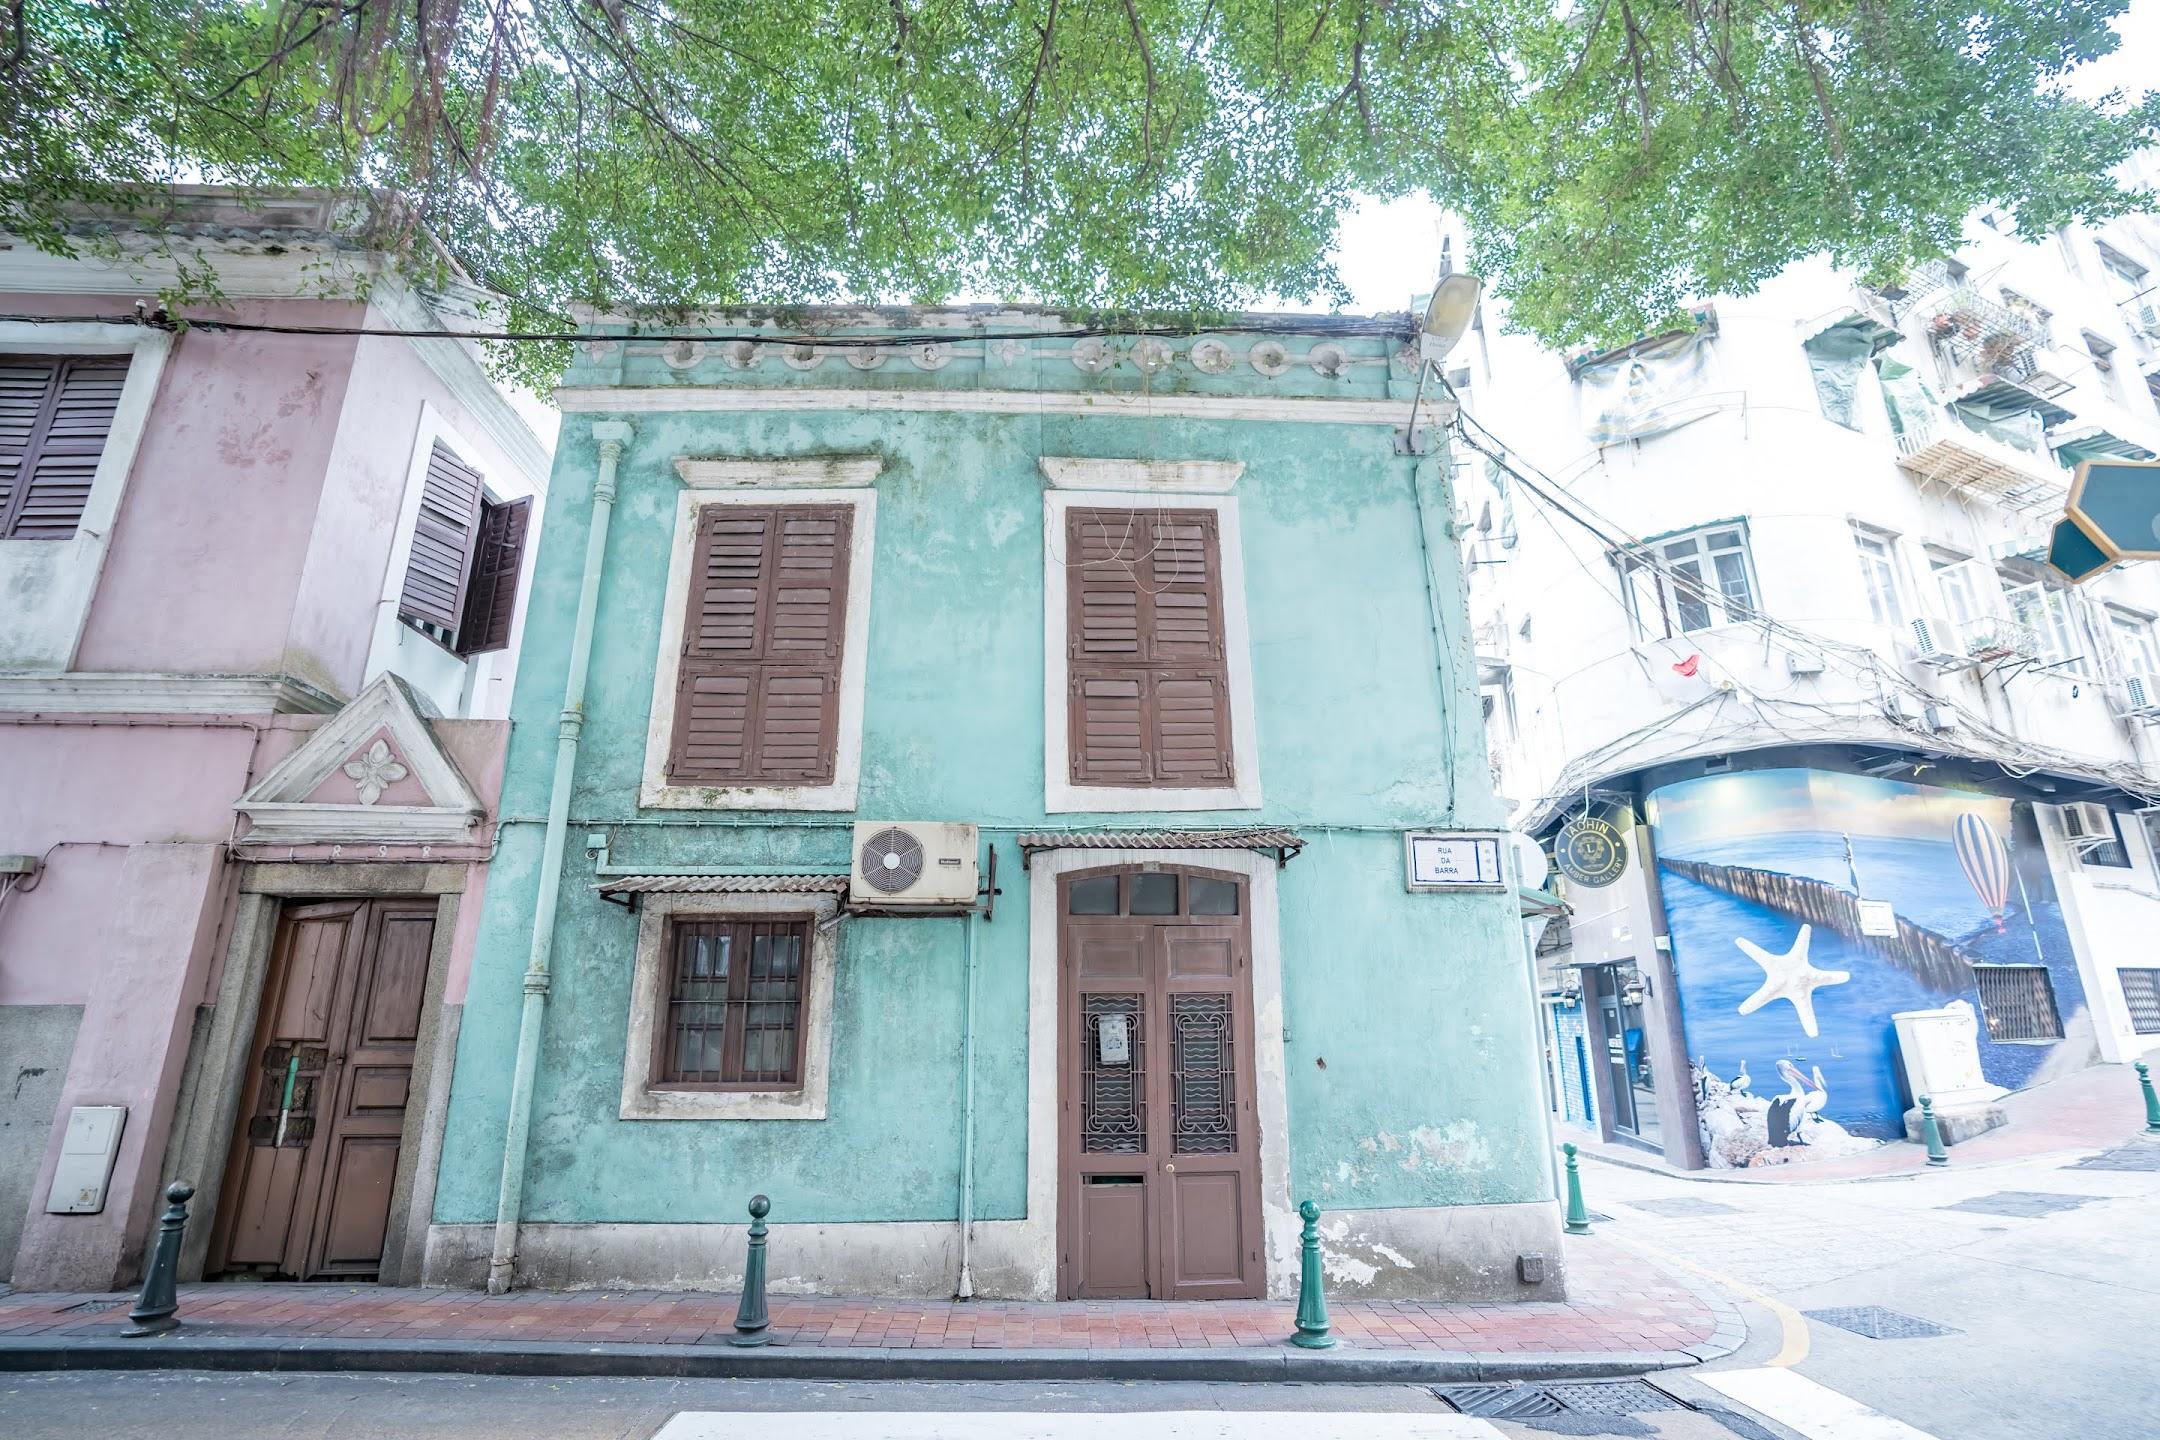 マカオ 鄭家屋敷(Mandarin's House/鄭家大屋/Casa do Mandarim)